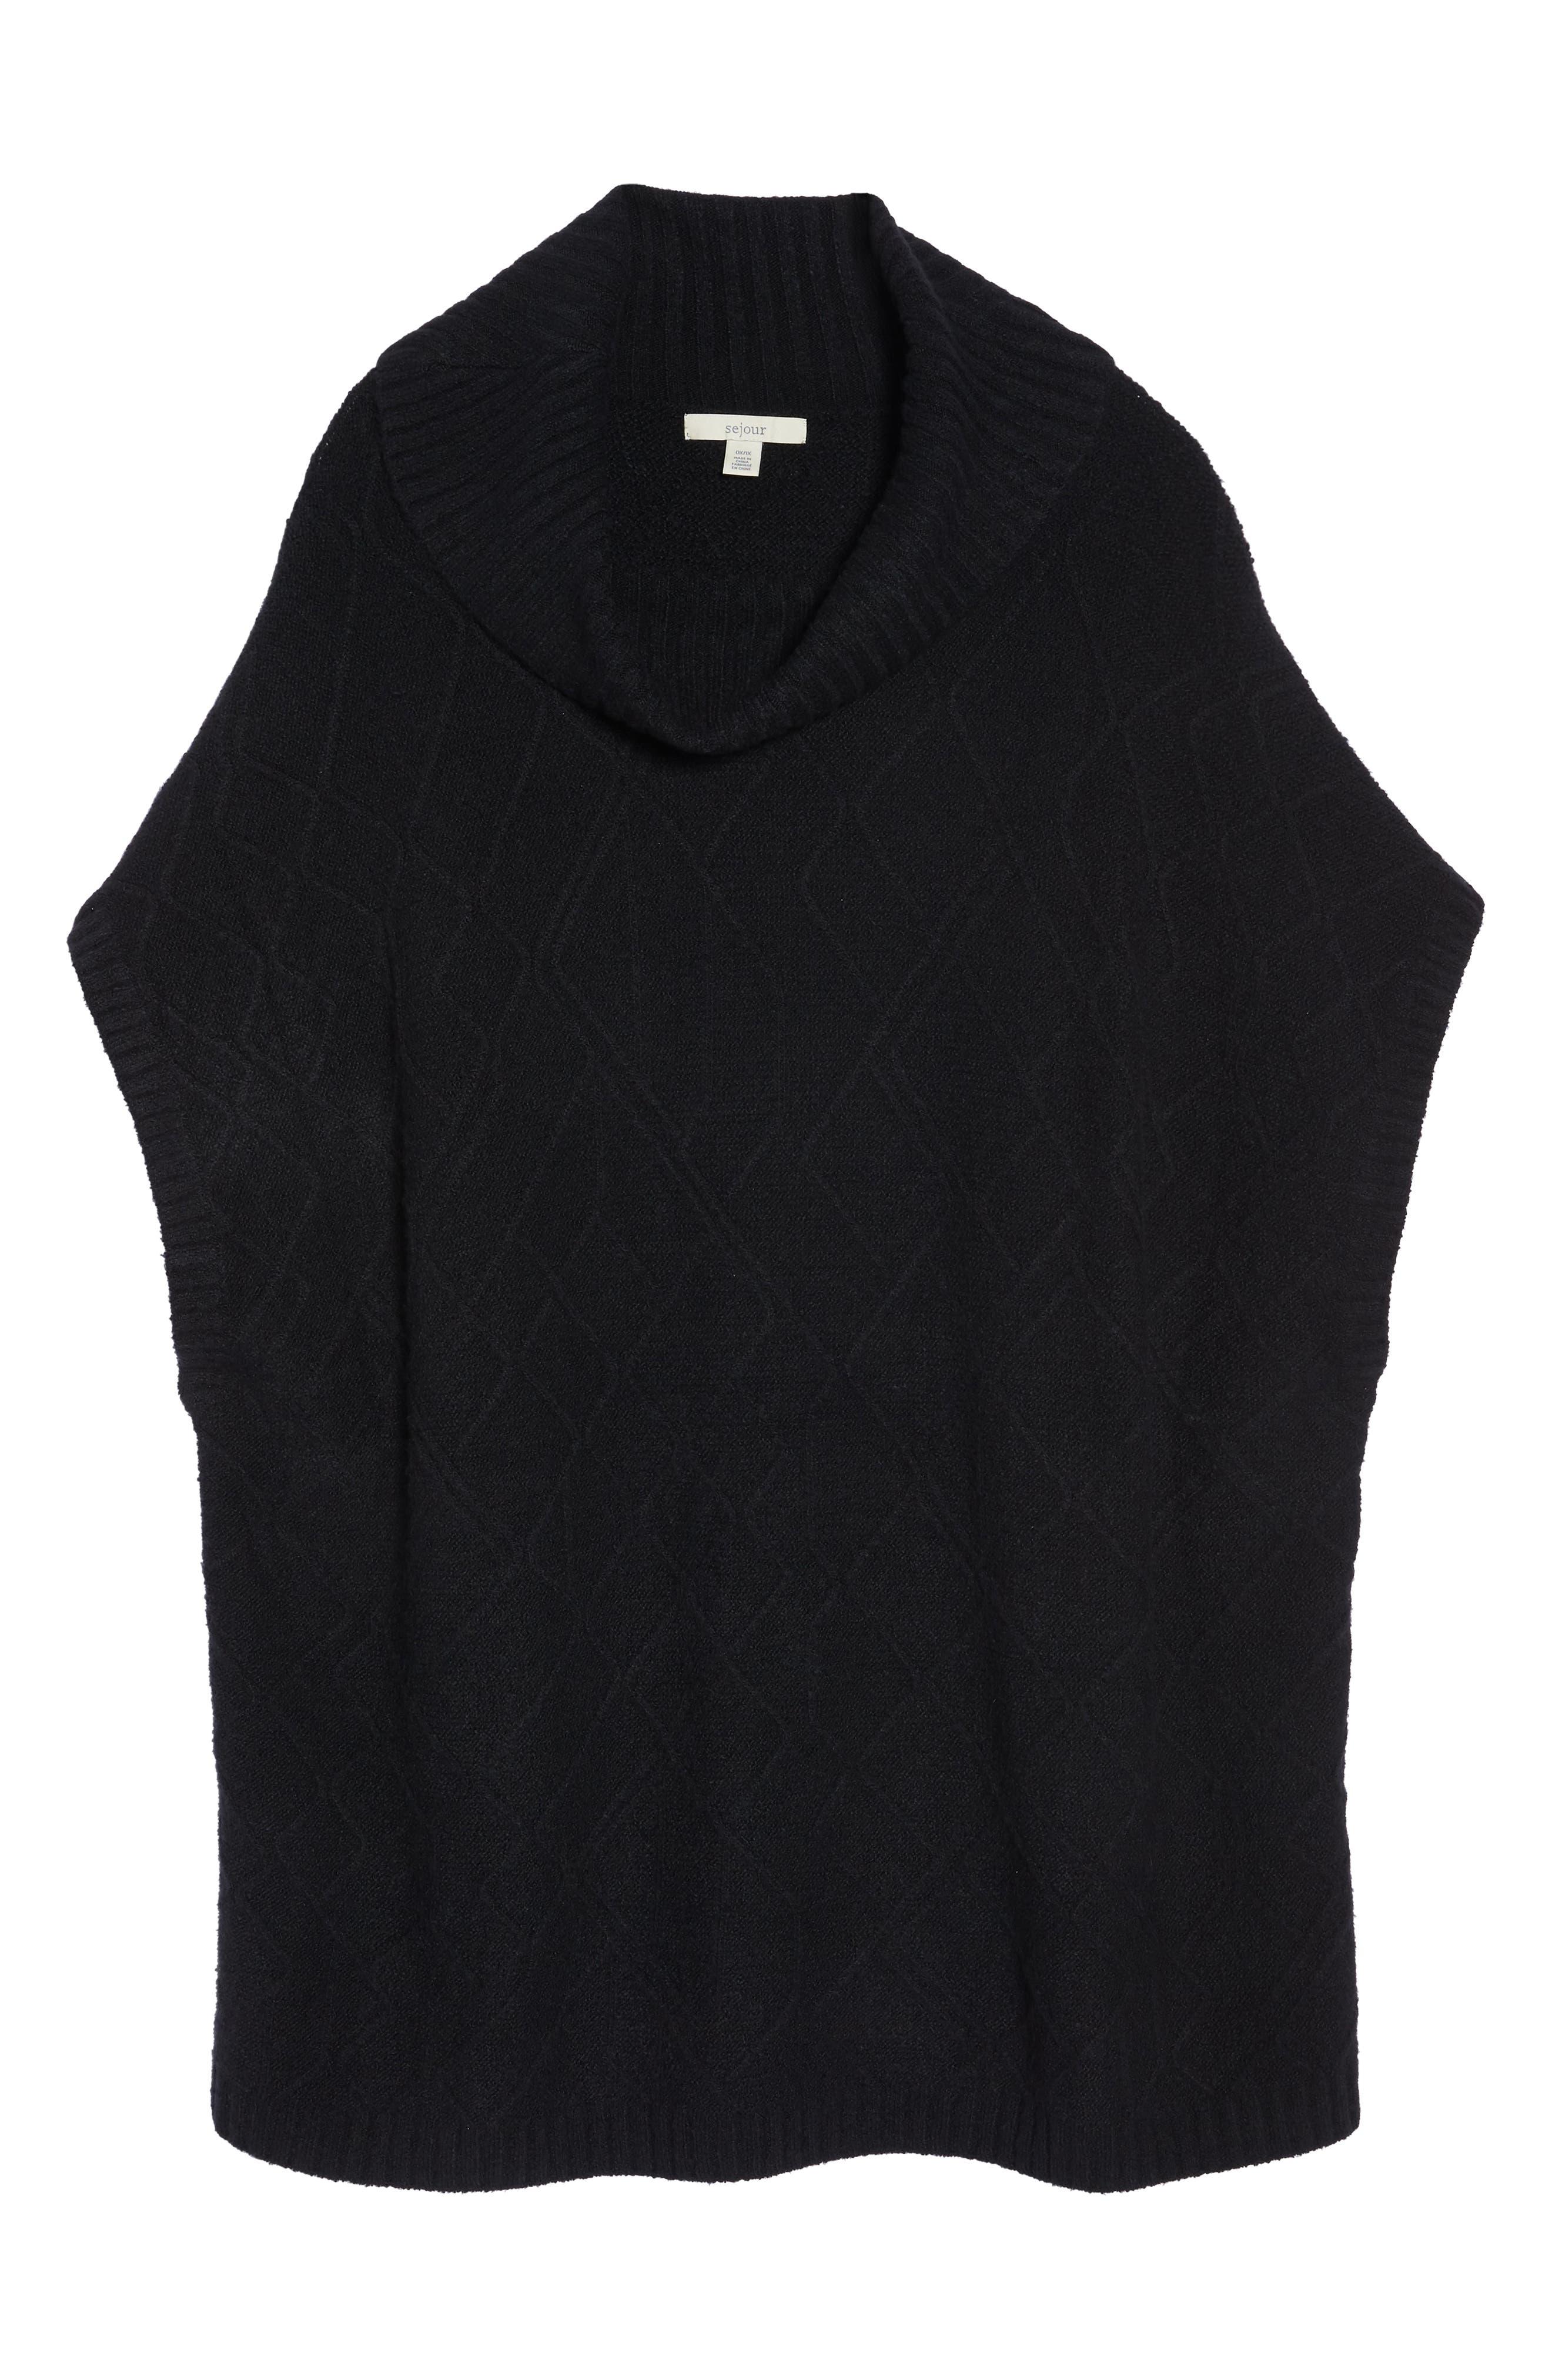 Poncho Sweater,                             Alternate thumbnail 6, color,                             BLACK